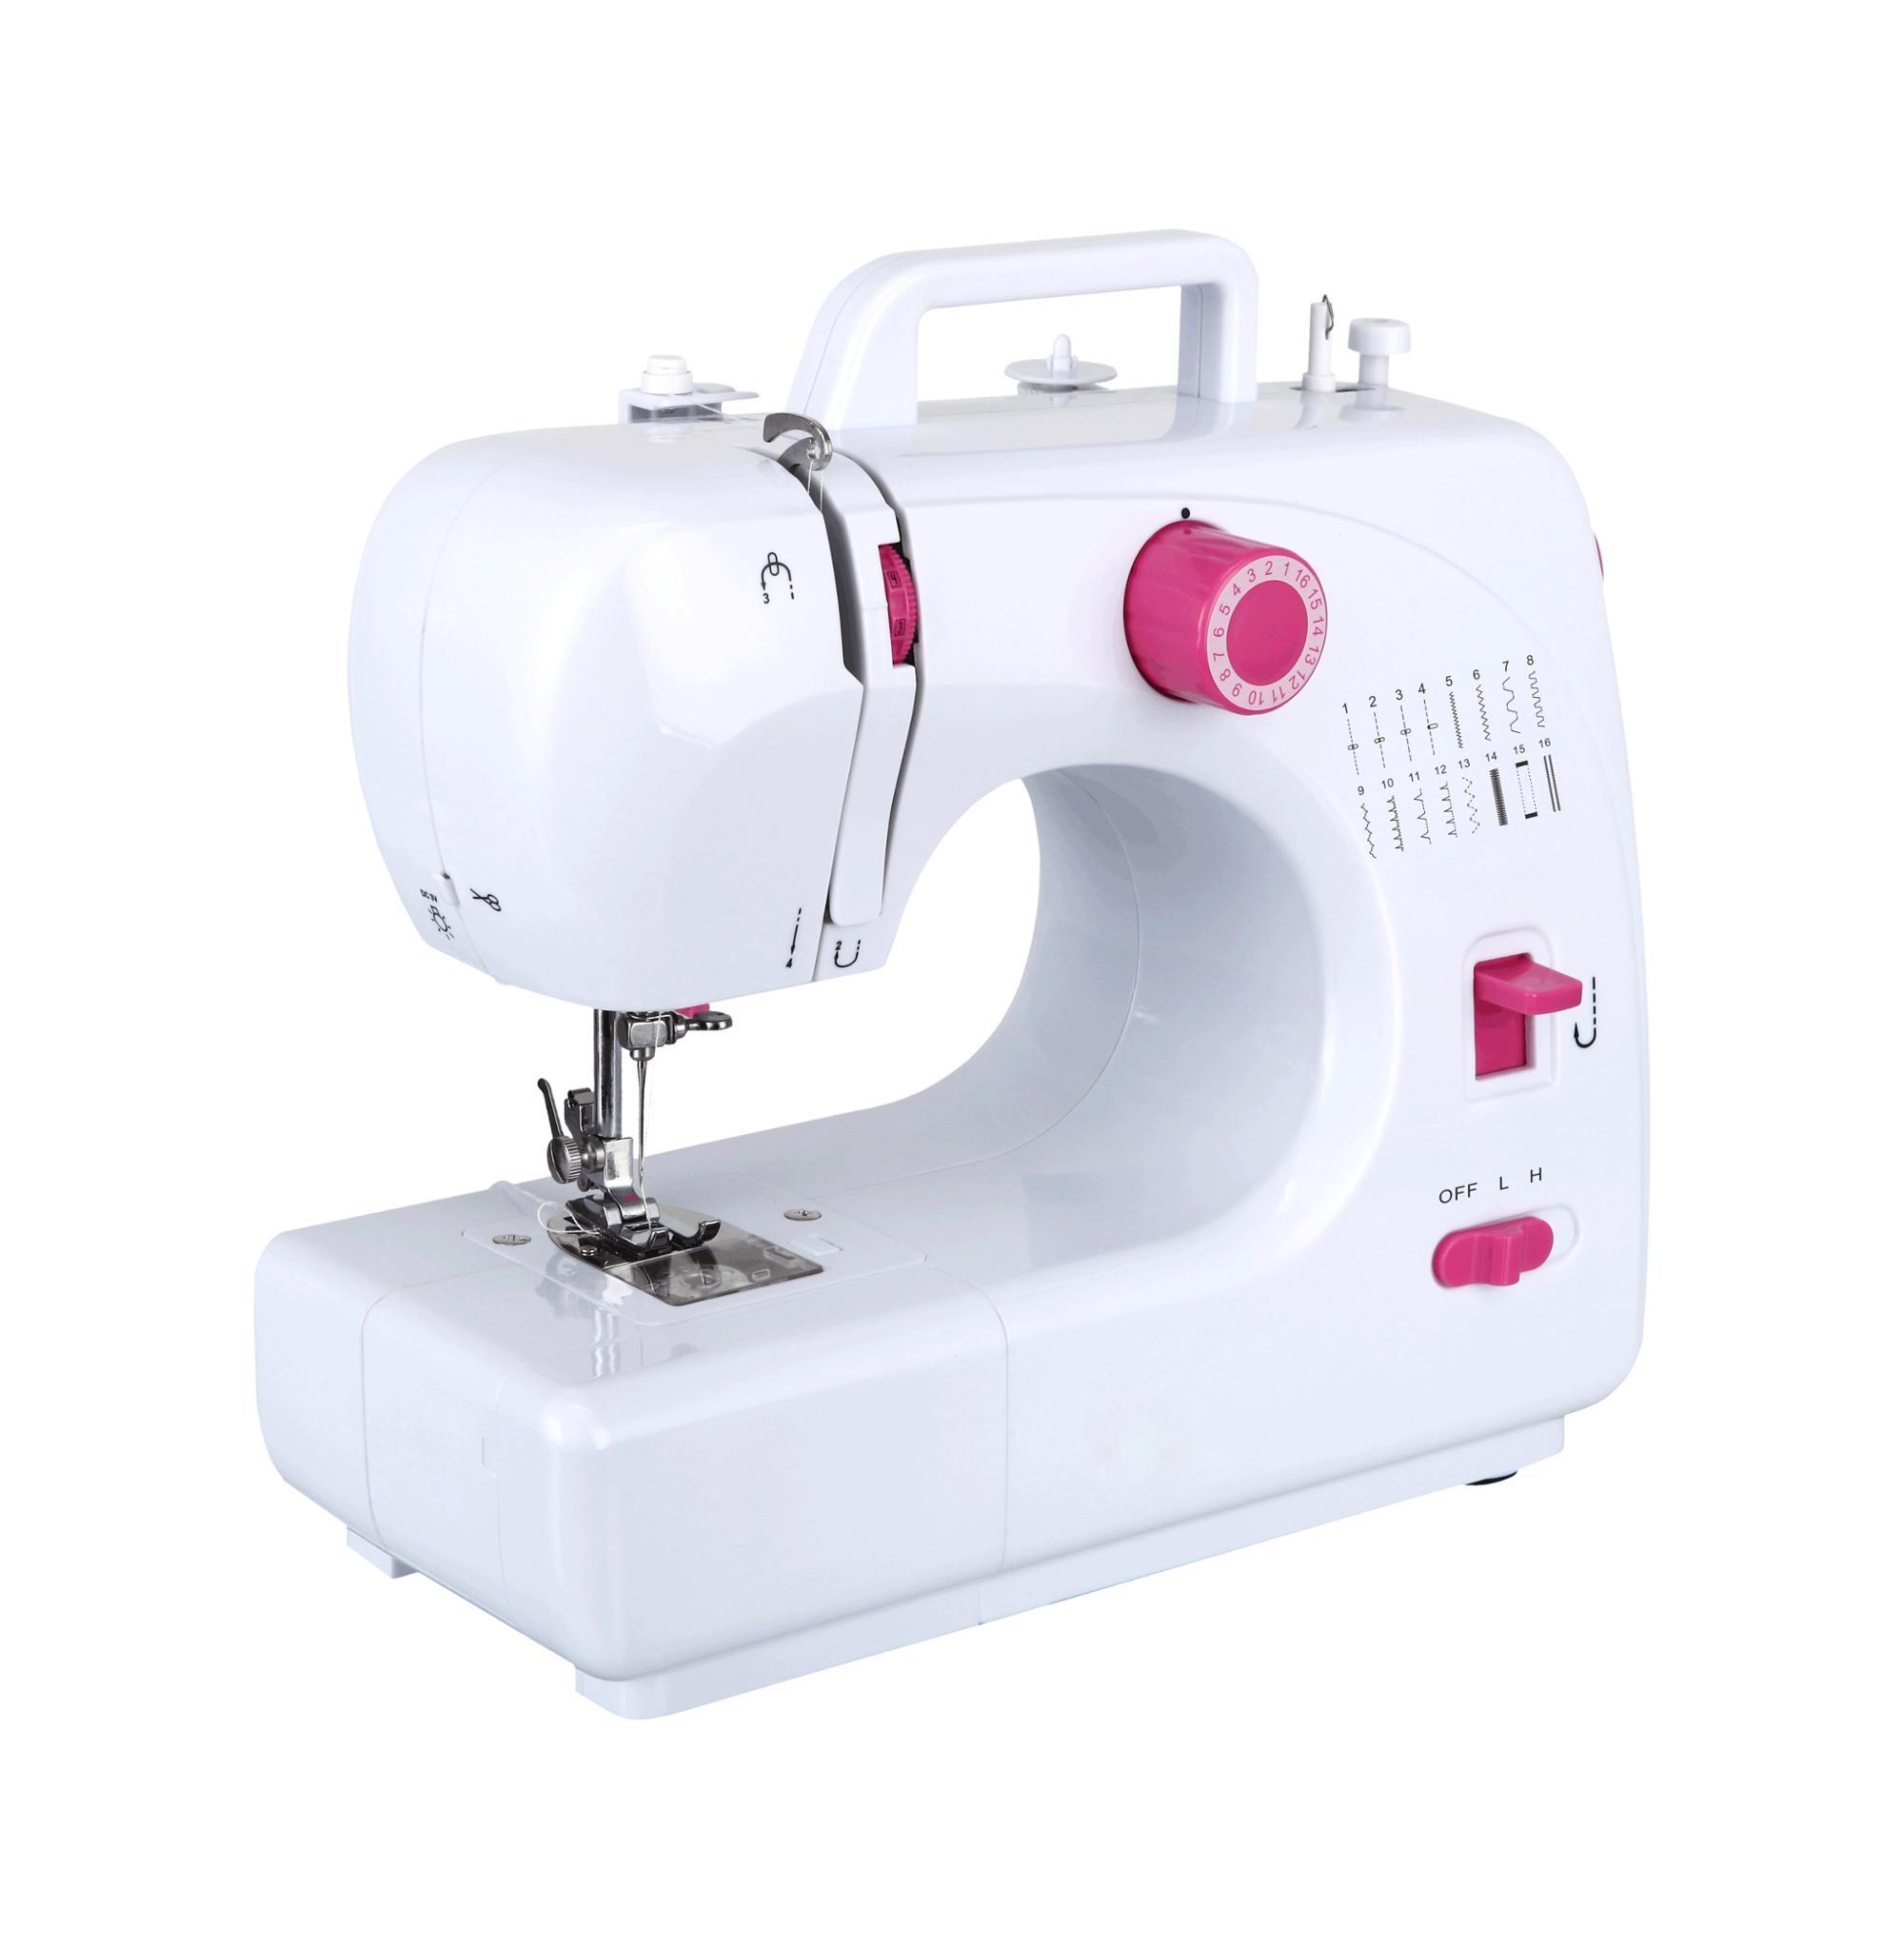 Fhsm-508 T-shirt Airbag Name Parts Sewing Machine - Buy T-shirt Sewing  Machine,Airbag Sewing Machine,Name Parts Sewing Machine Product on  Alibaba com